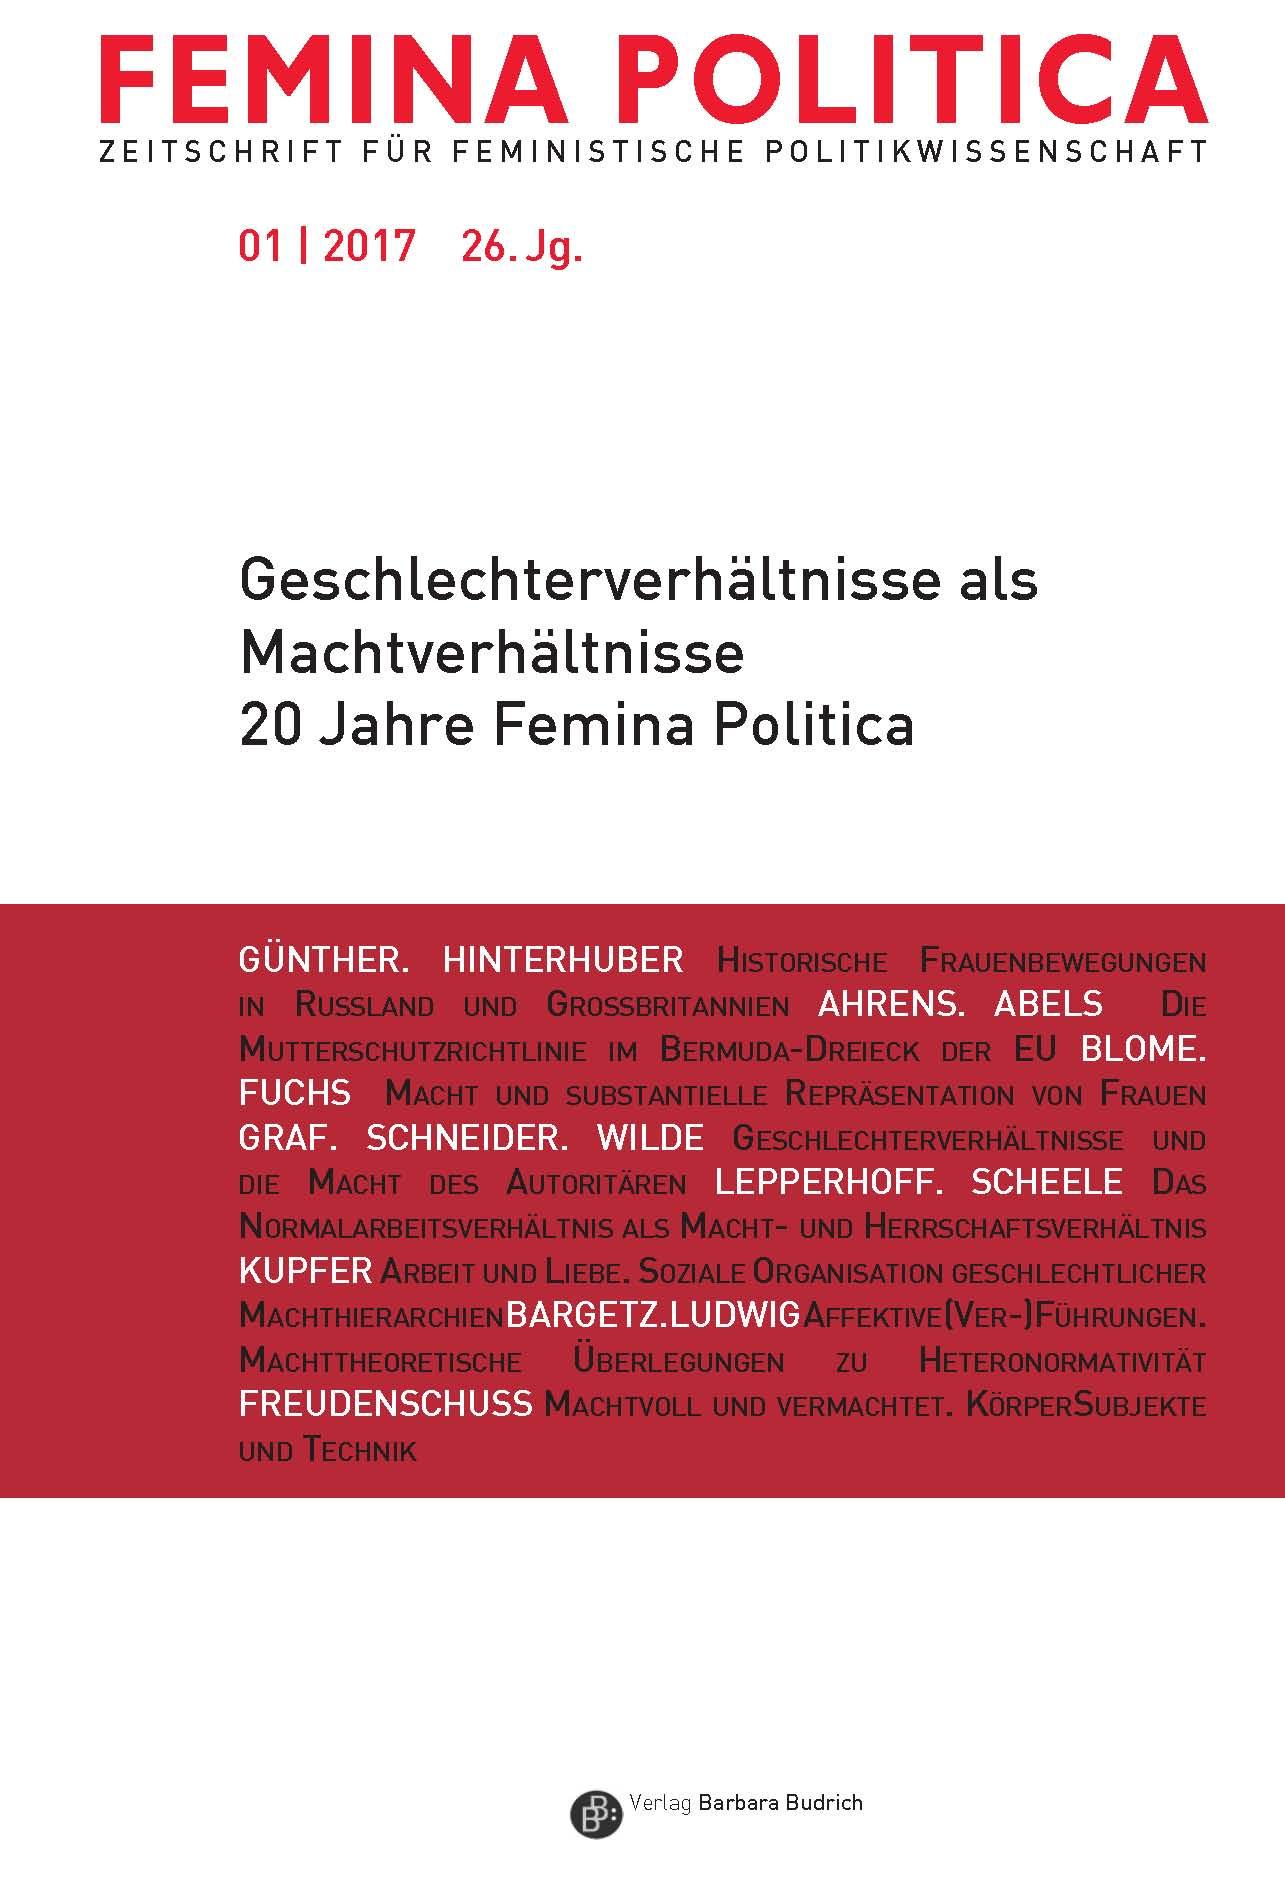 Femina Politica Heft 1-2017 | Geschlechterverhältnisse als Machtverhältnisse